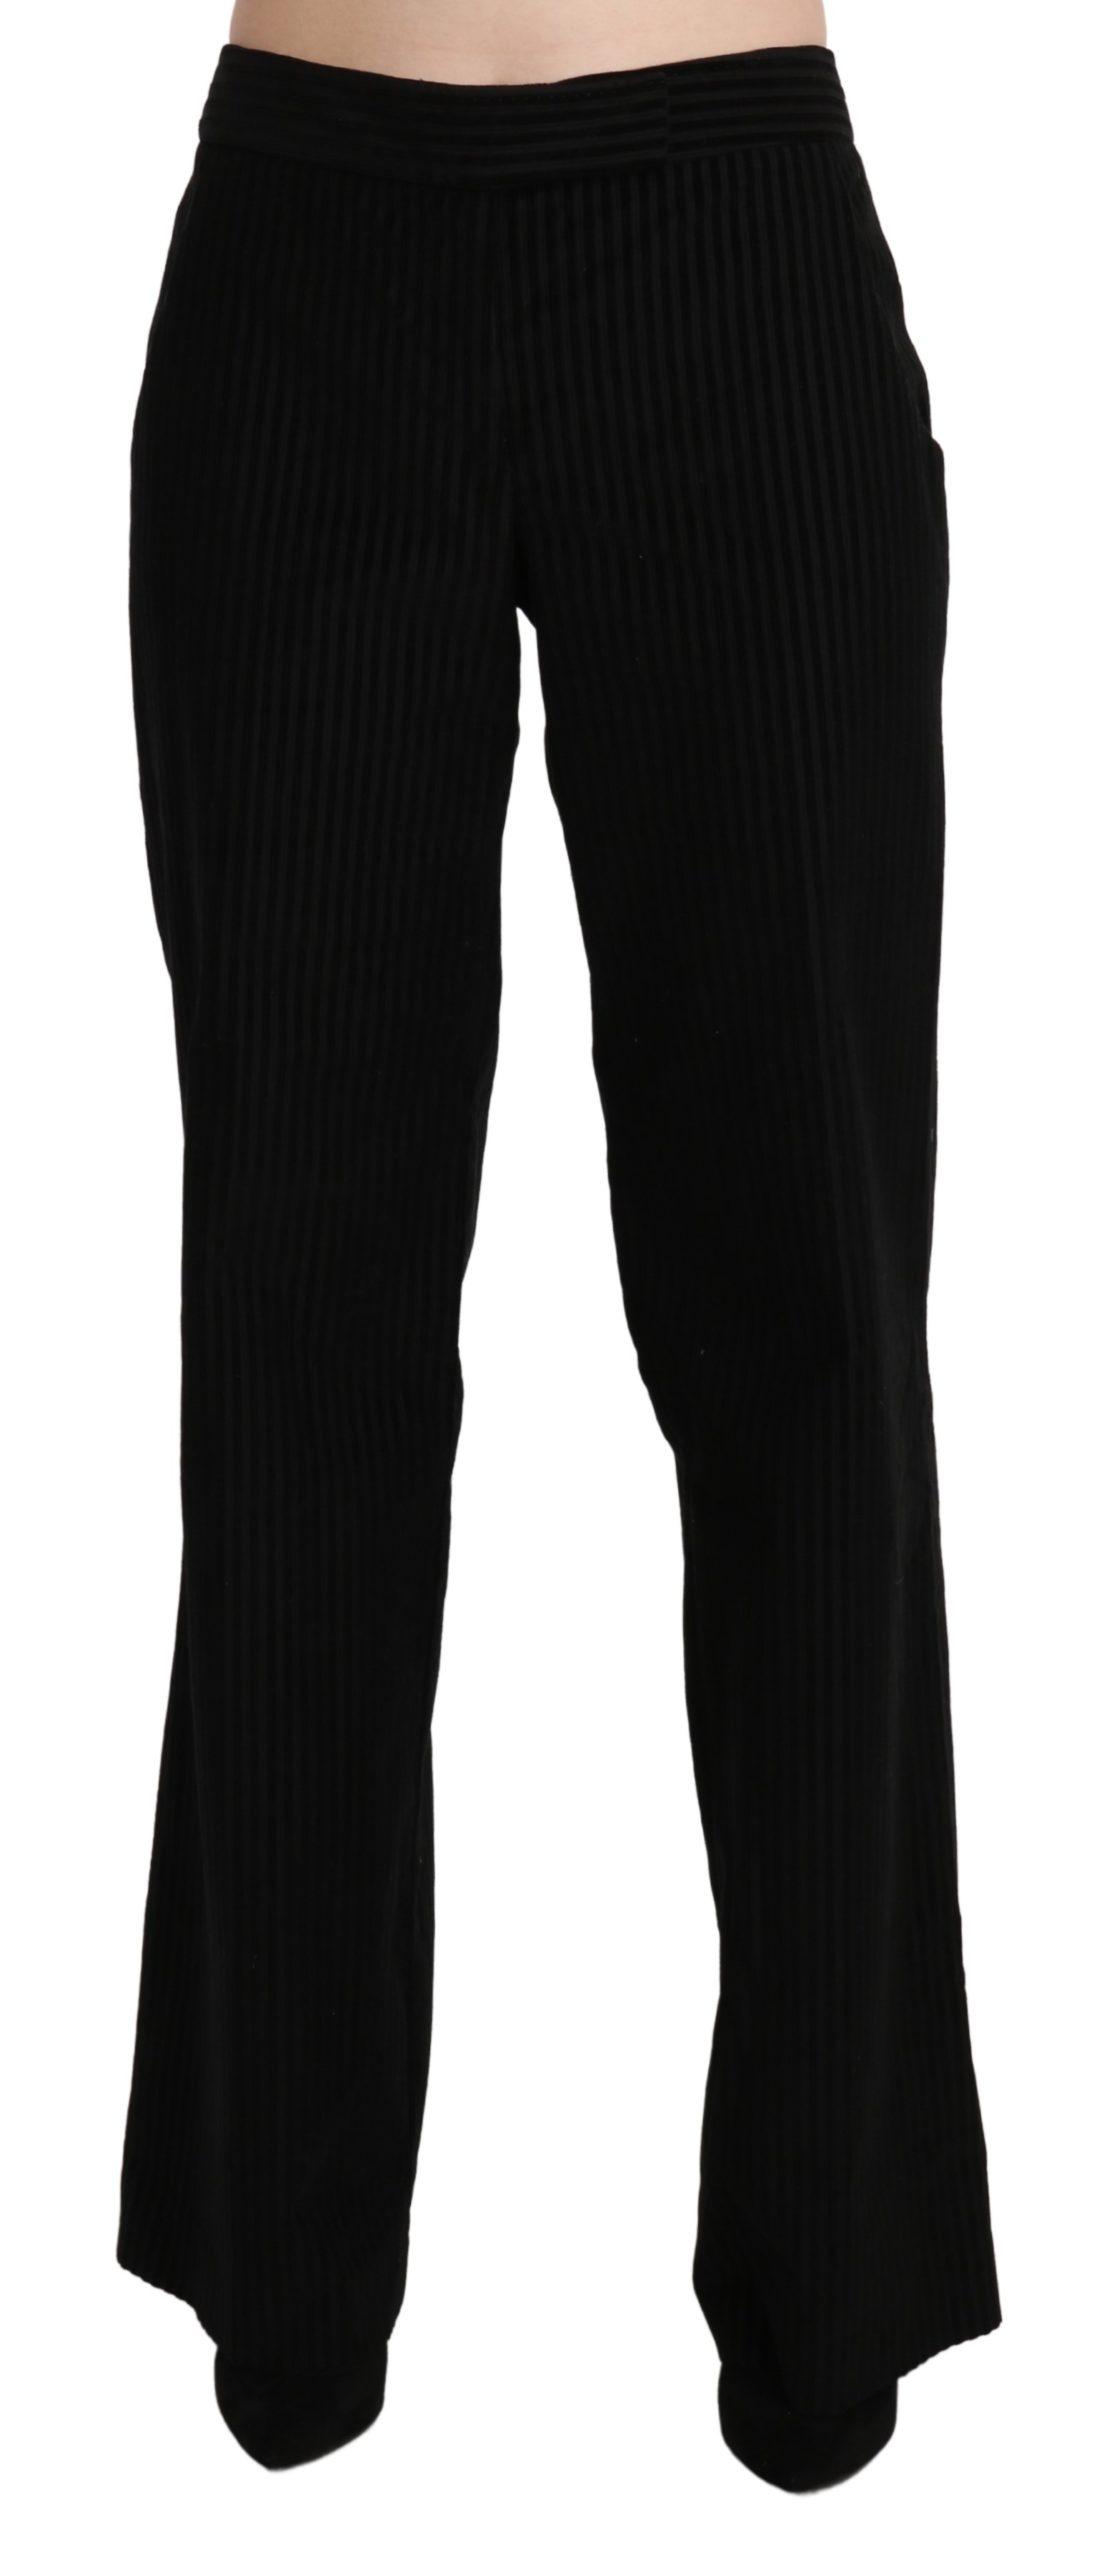 Cotton Black High Waist Flared Pants - IT44|L